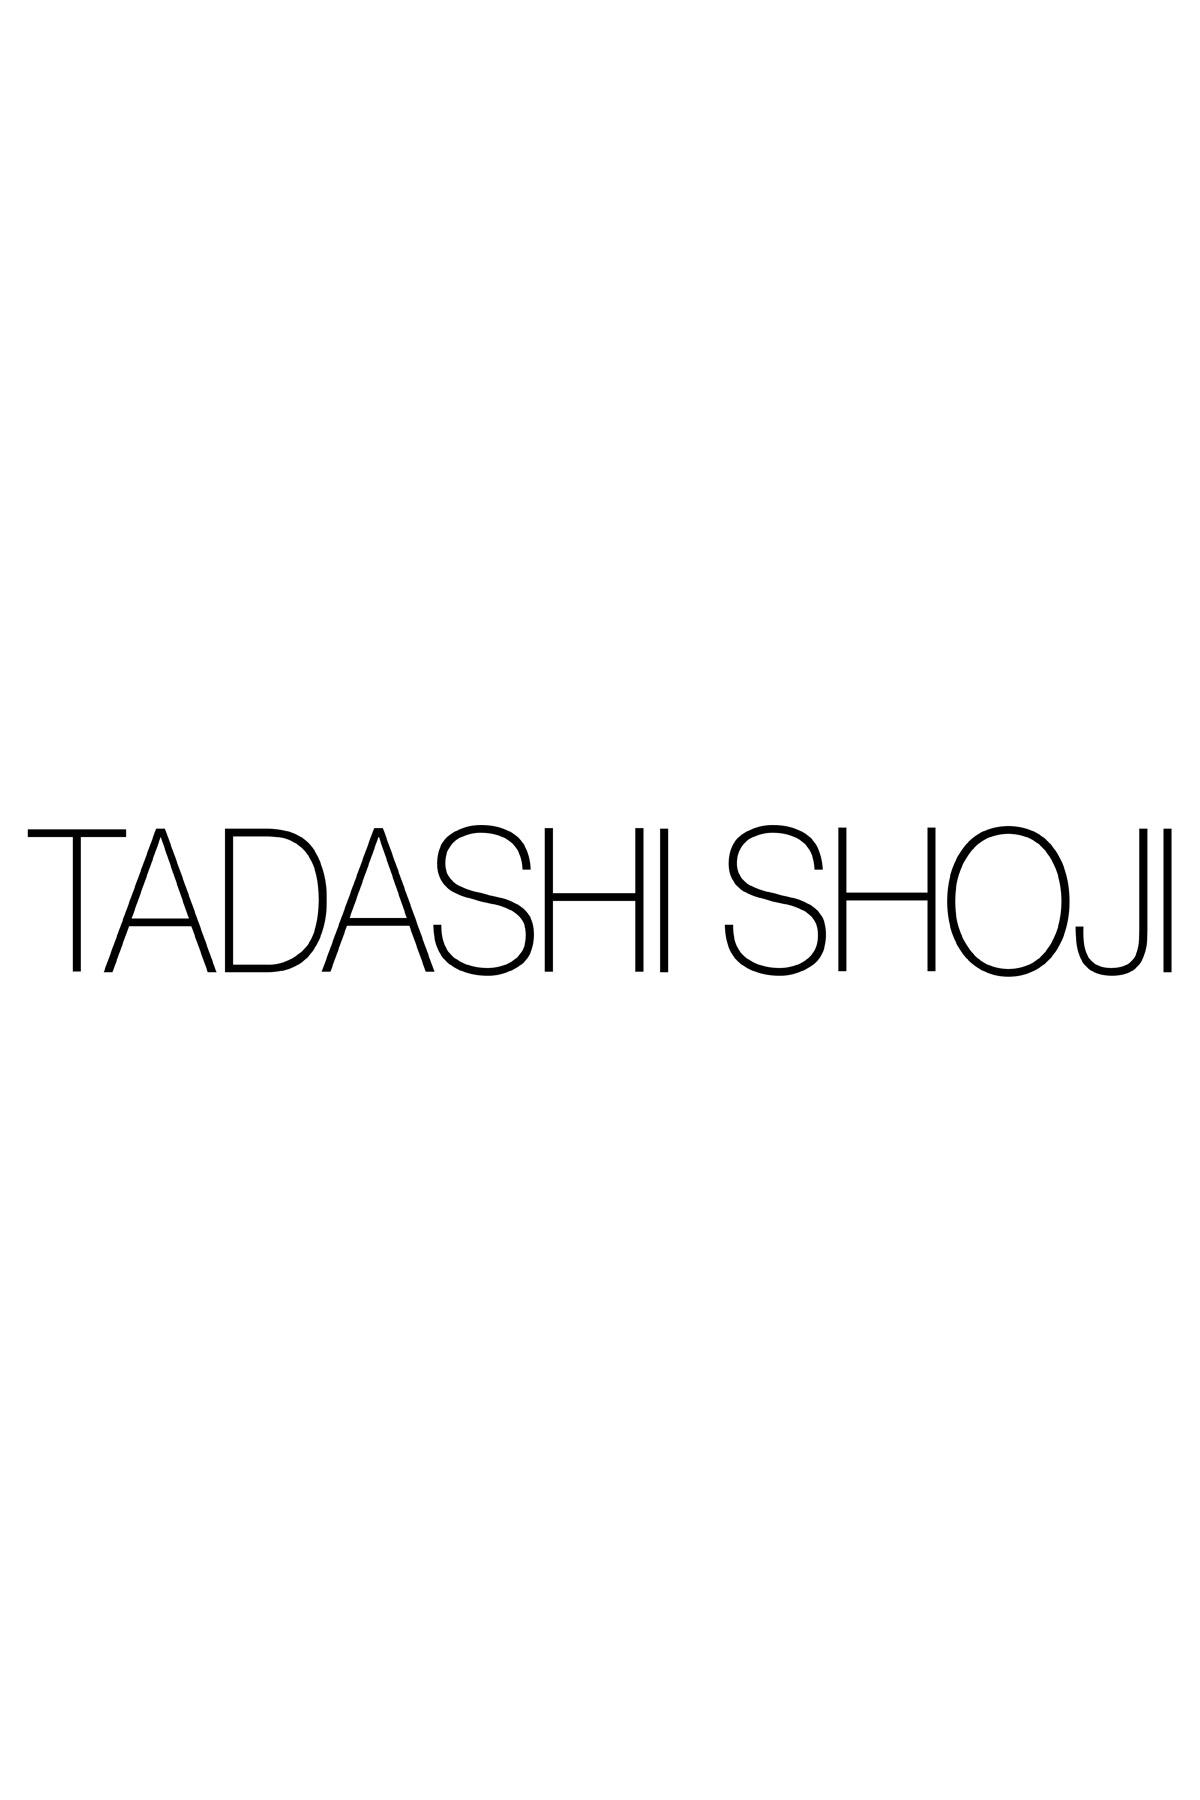 Tadashi Shoji - Crisette Earring